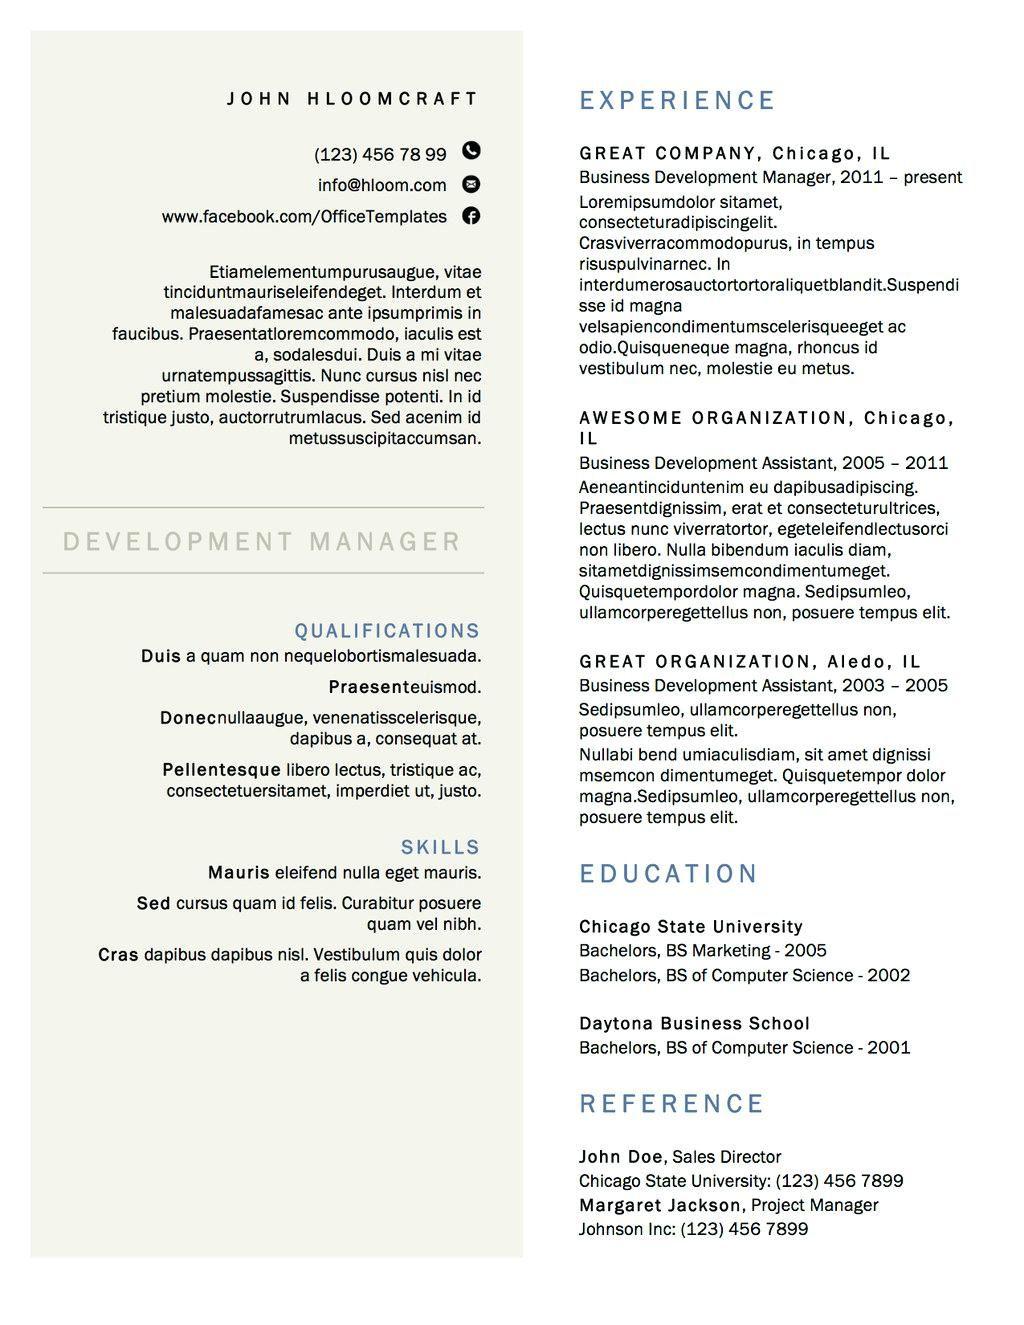 Free 2 Column Resume Templates Resume design free